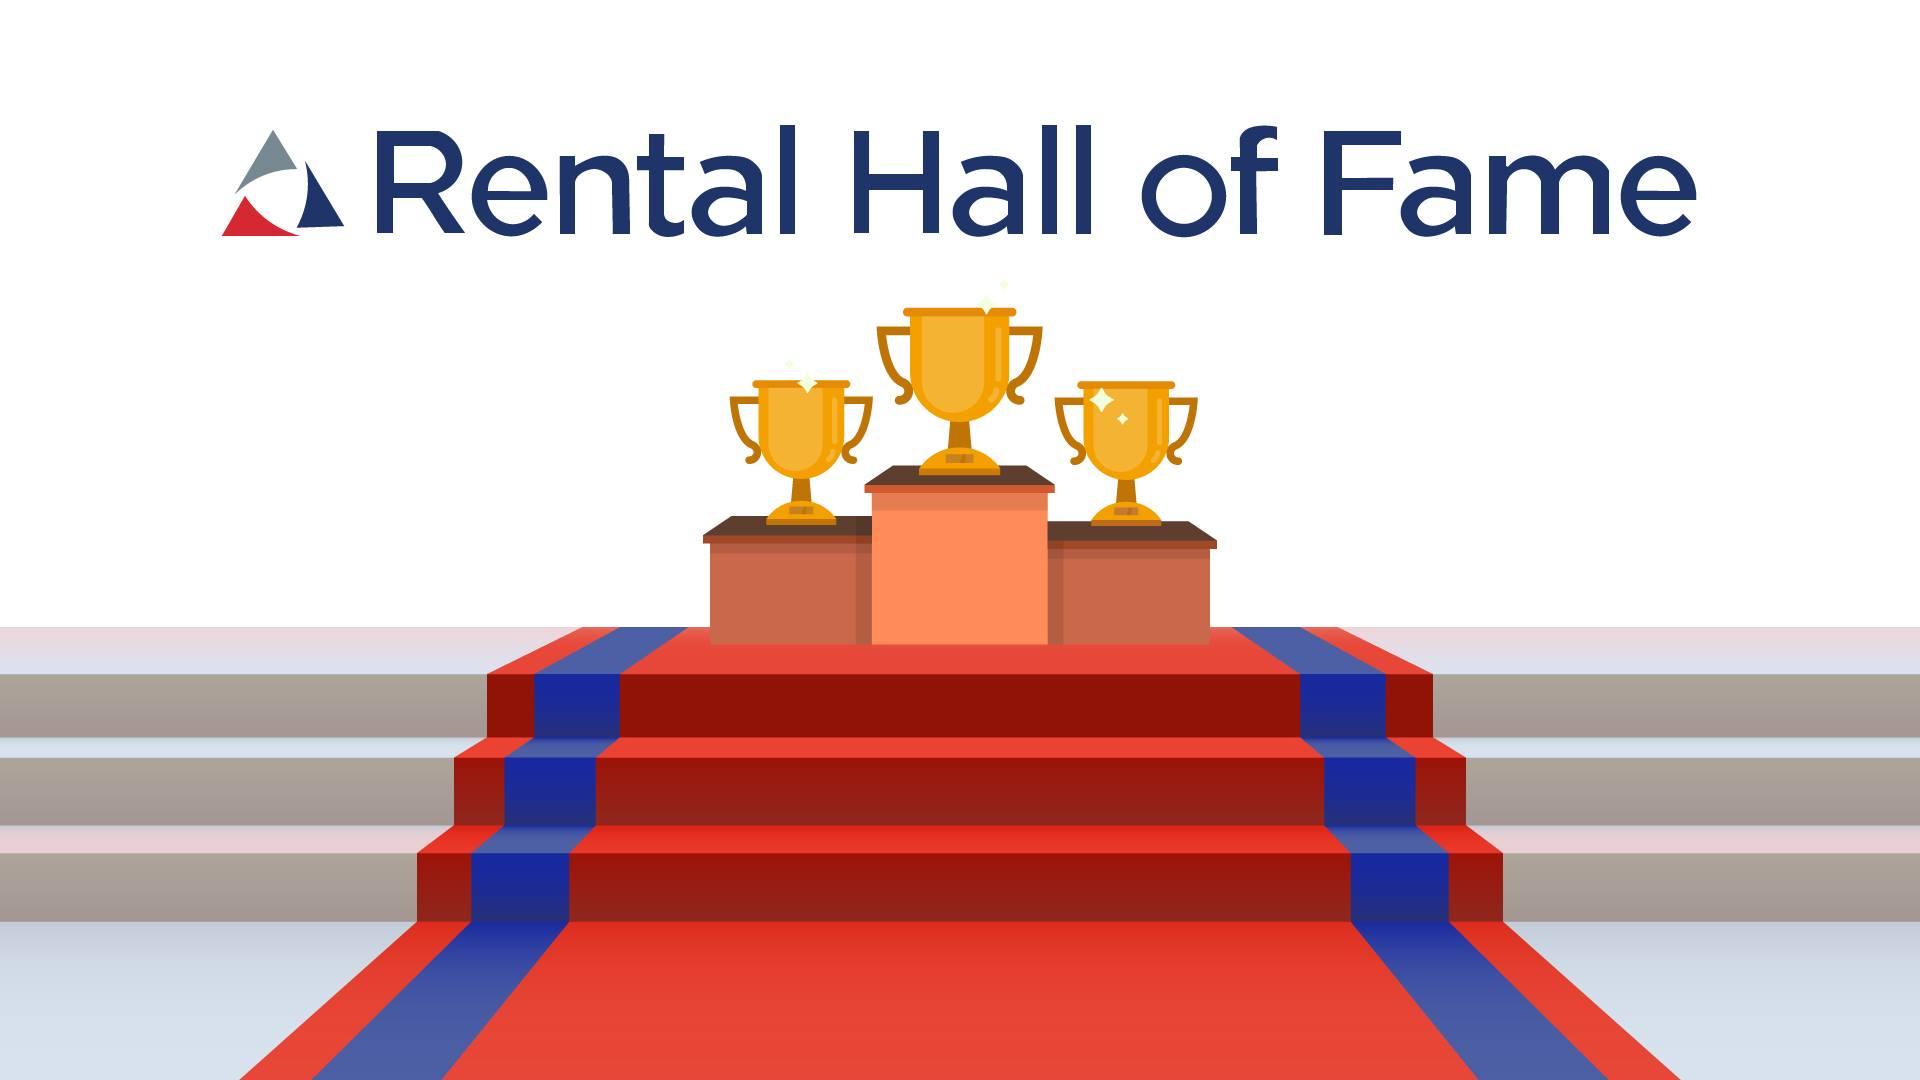 ARA Rental Hall of Fame graphic